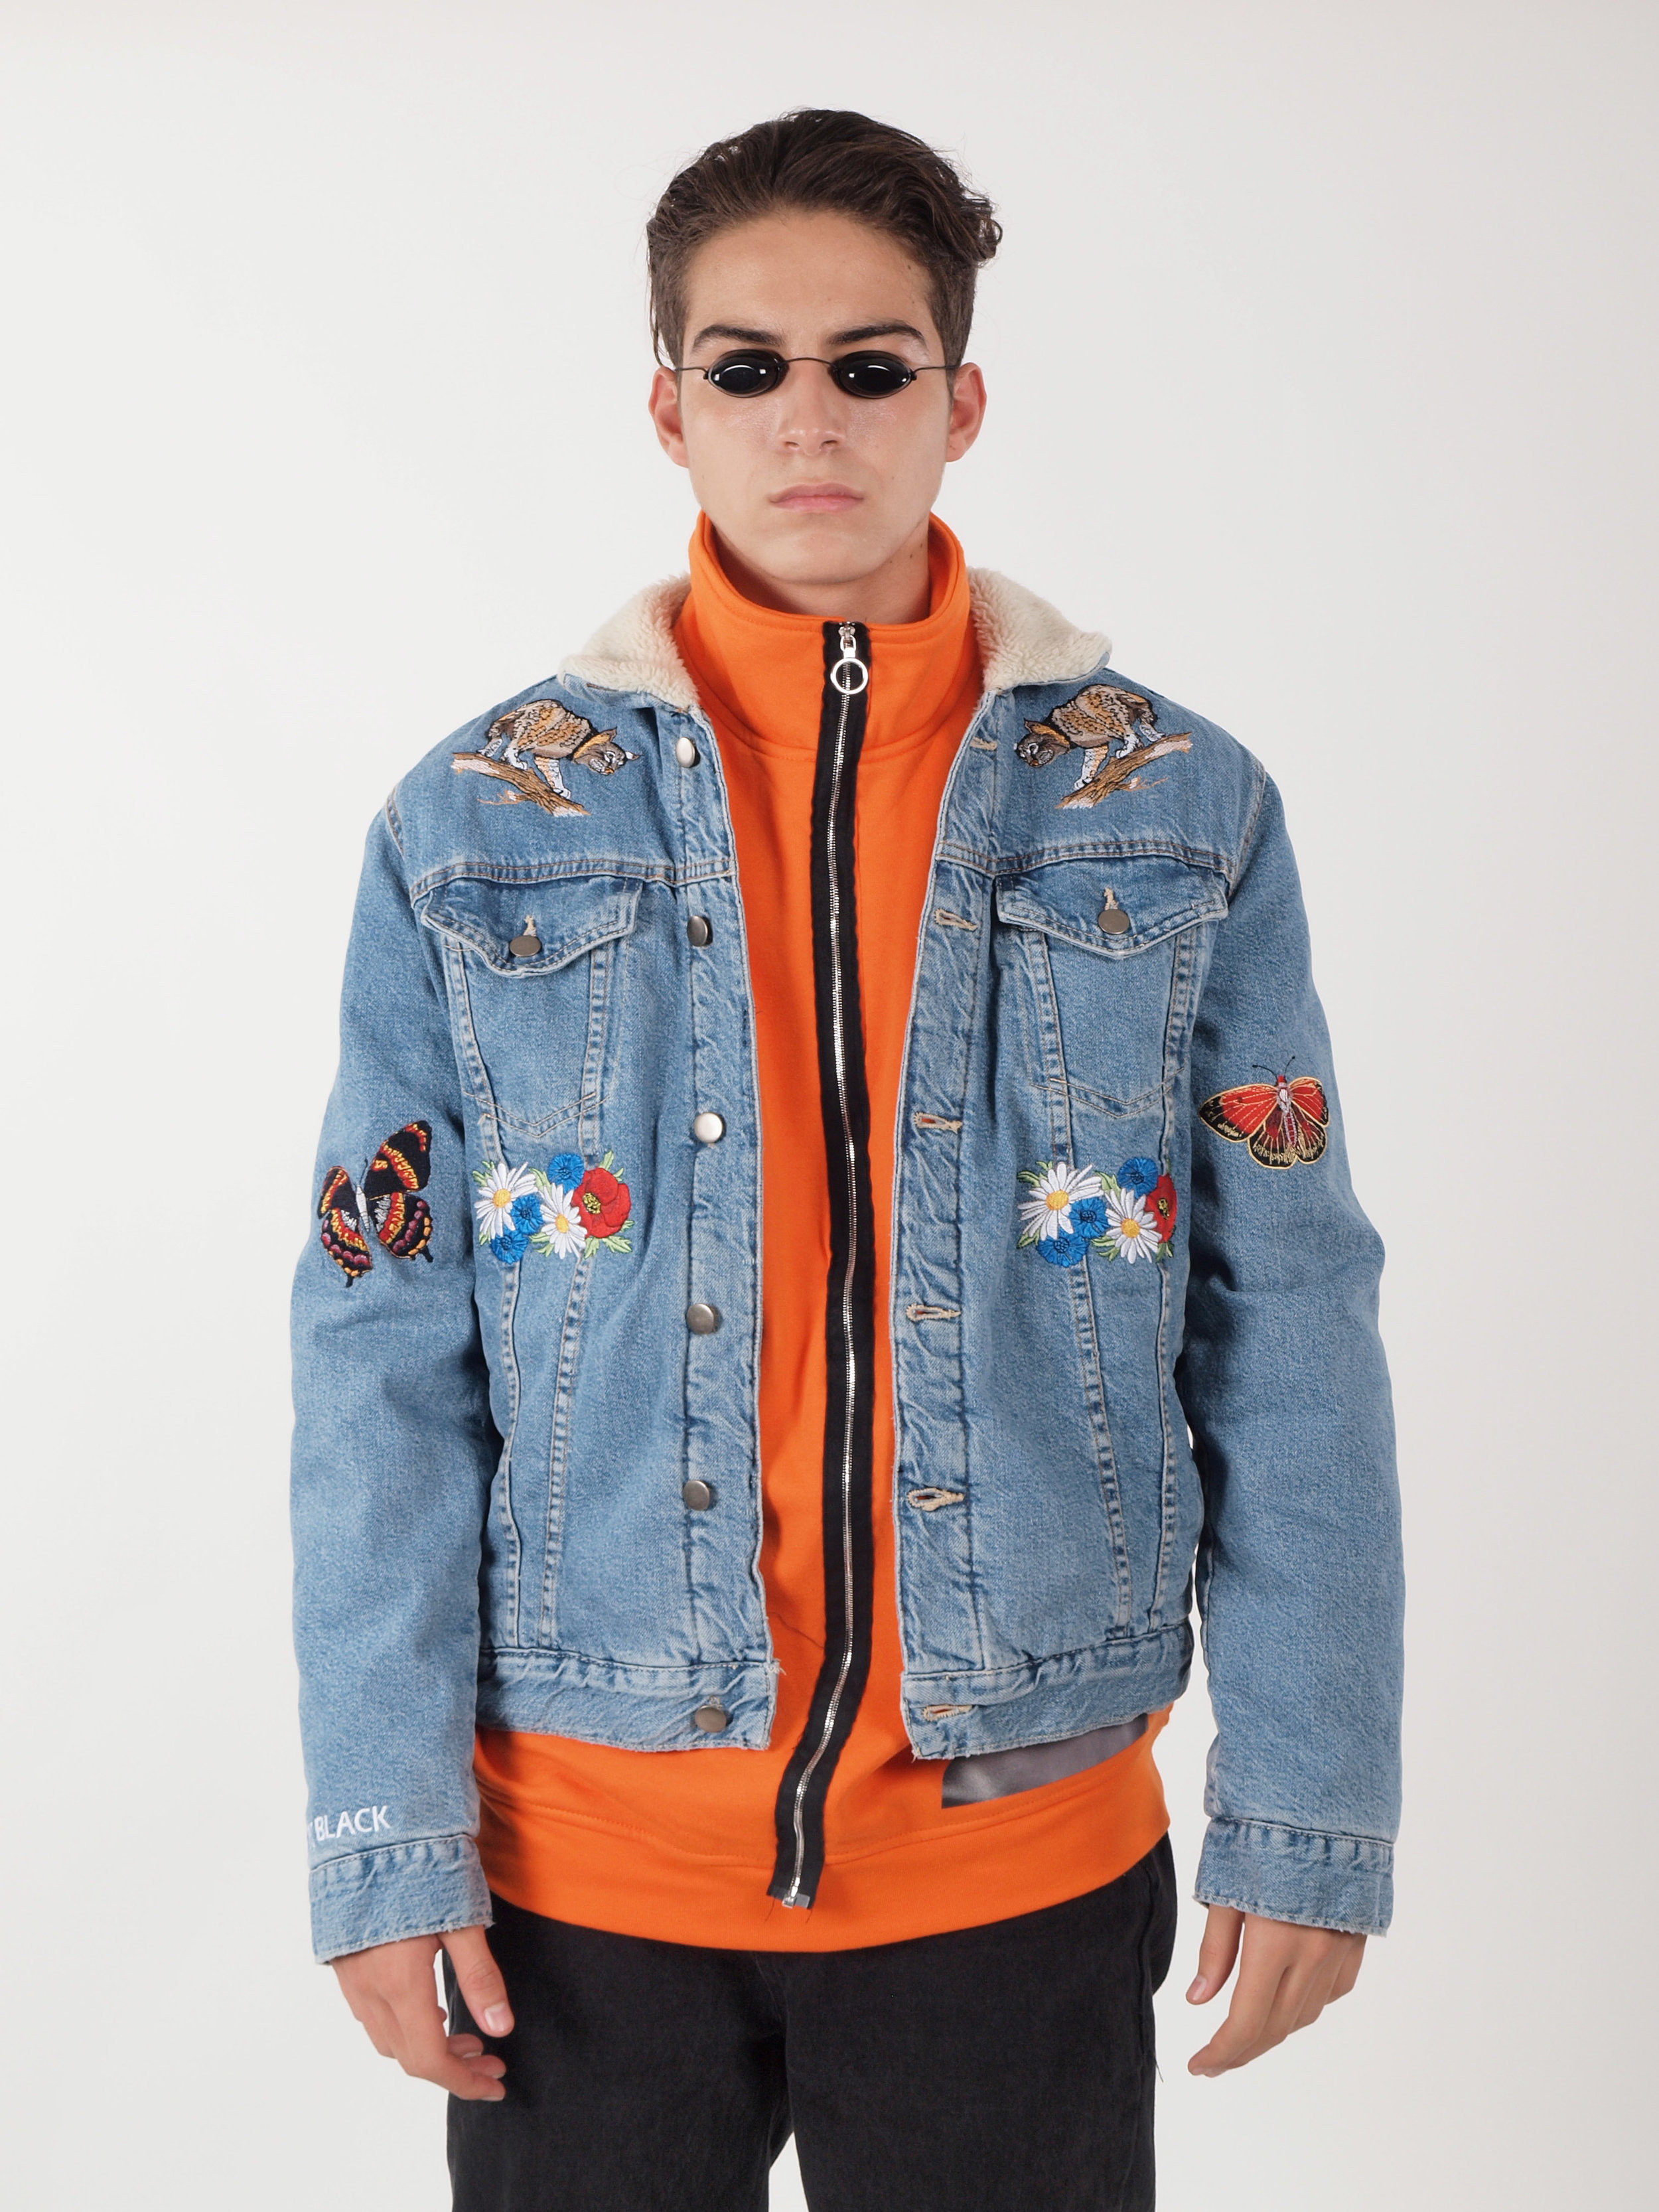 shearling denim jacket.jpg